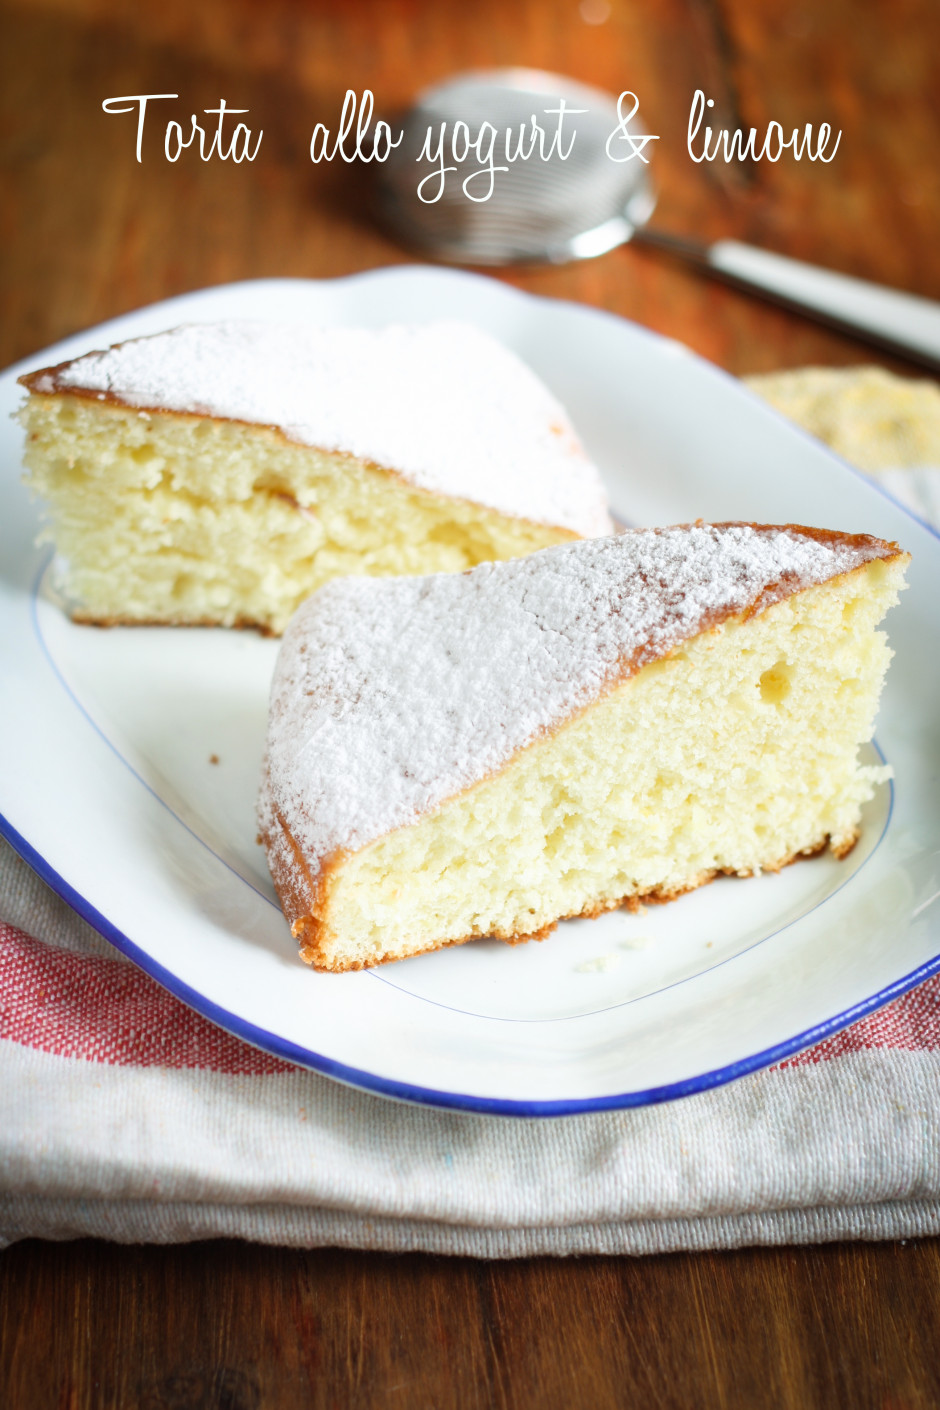 torta allo yogurt e limone 2 940x1410 Torta allo yogurt e limone